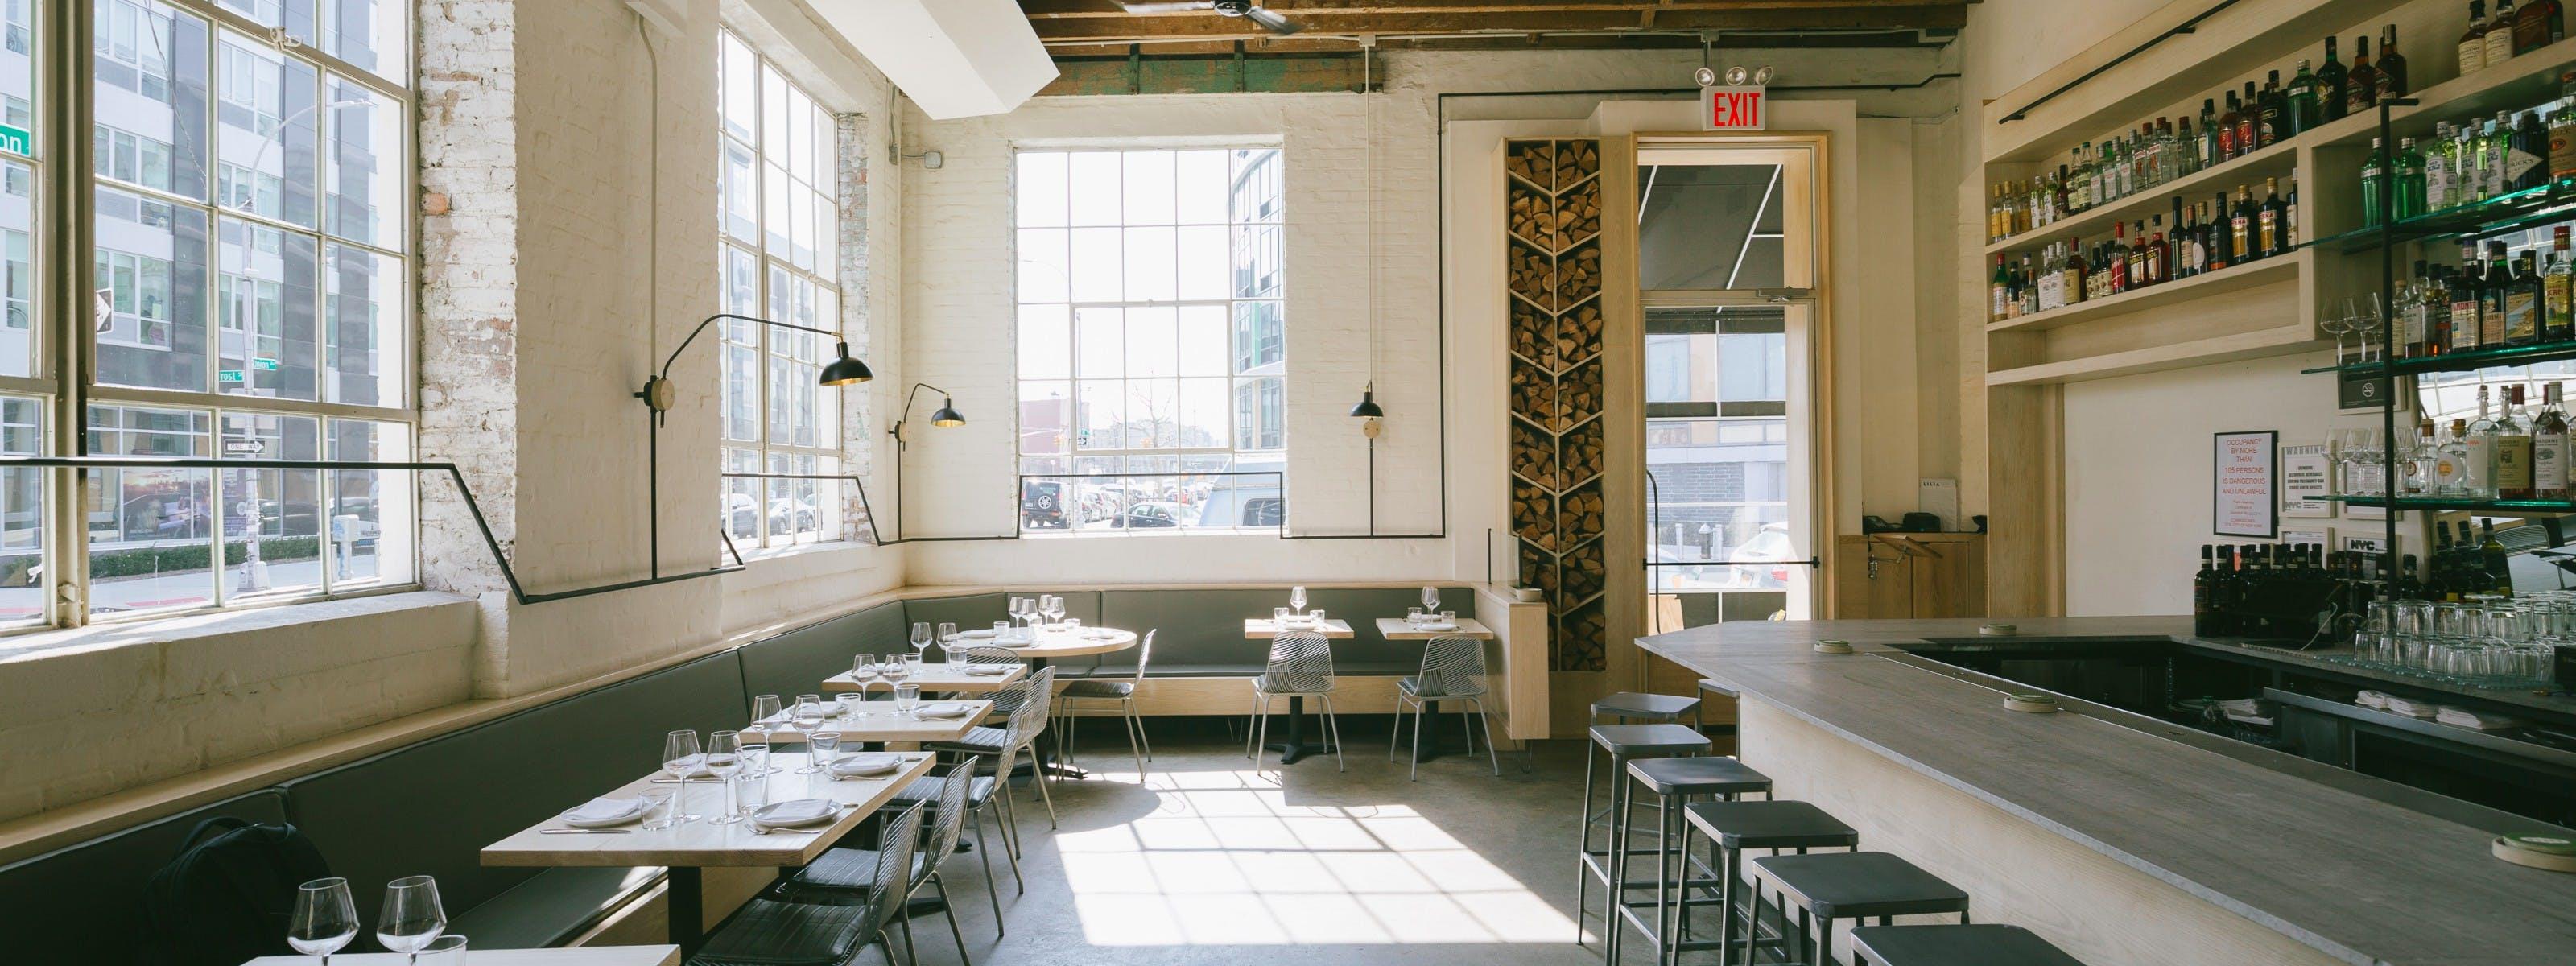 The Best Restaurants In Williamsburg - New York - The Infatuation